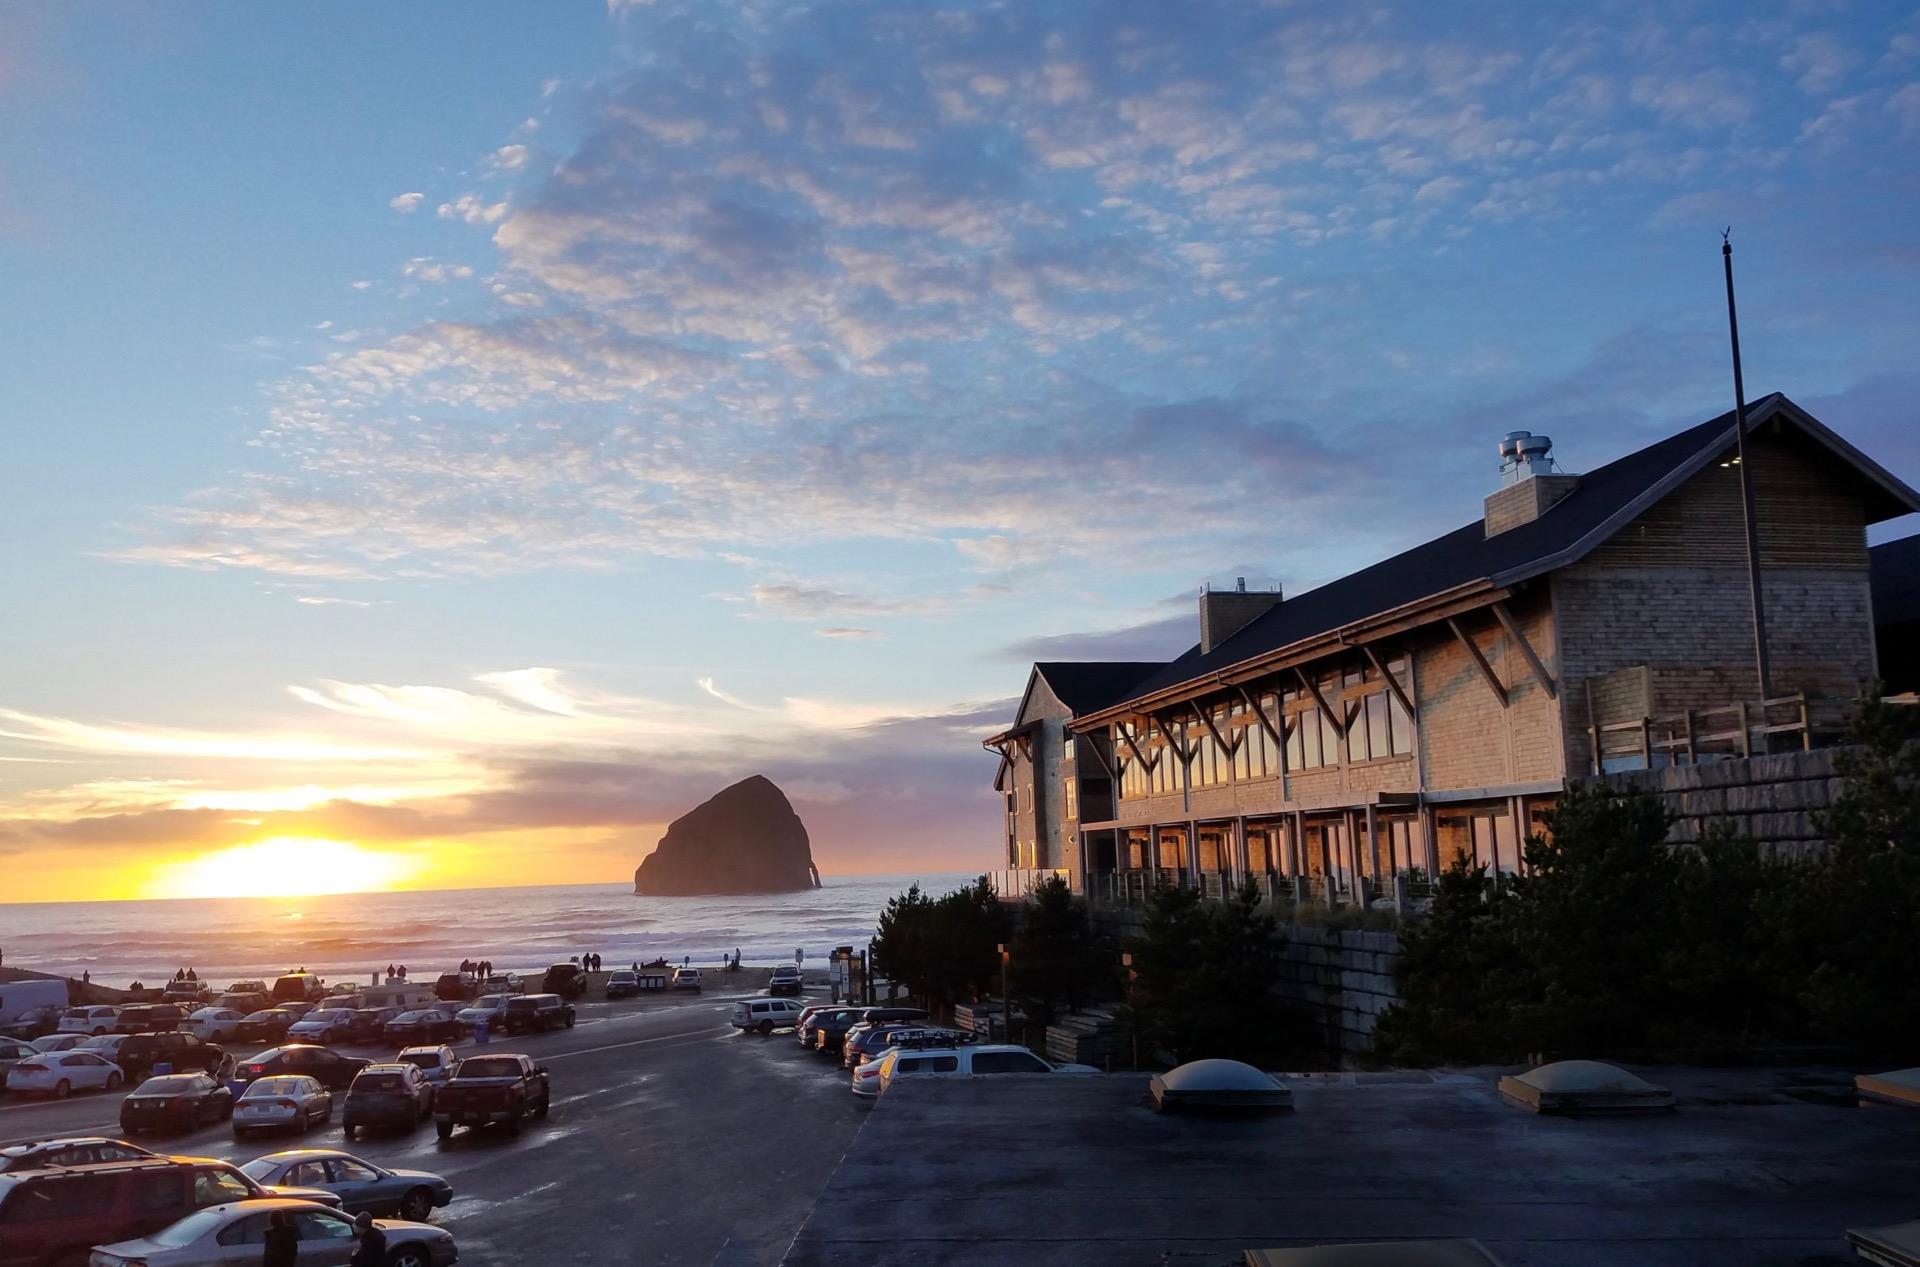 Headlands coastal lodge spa pacific city oregon spas for Pacific city oregon cabins